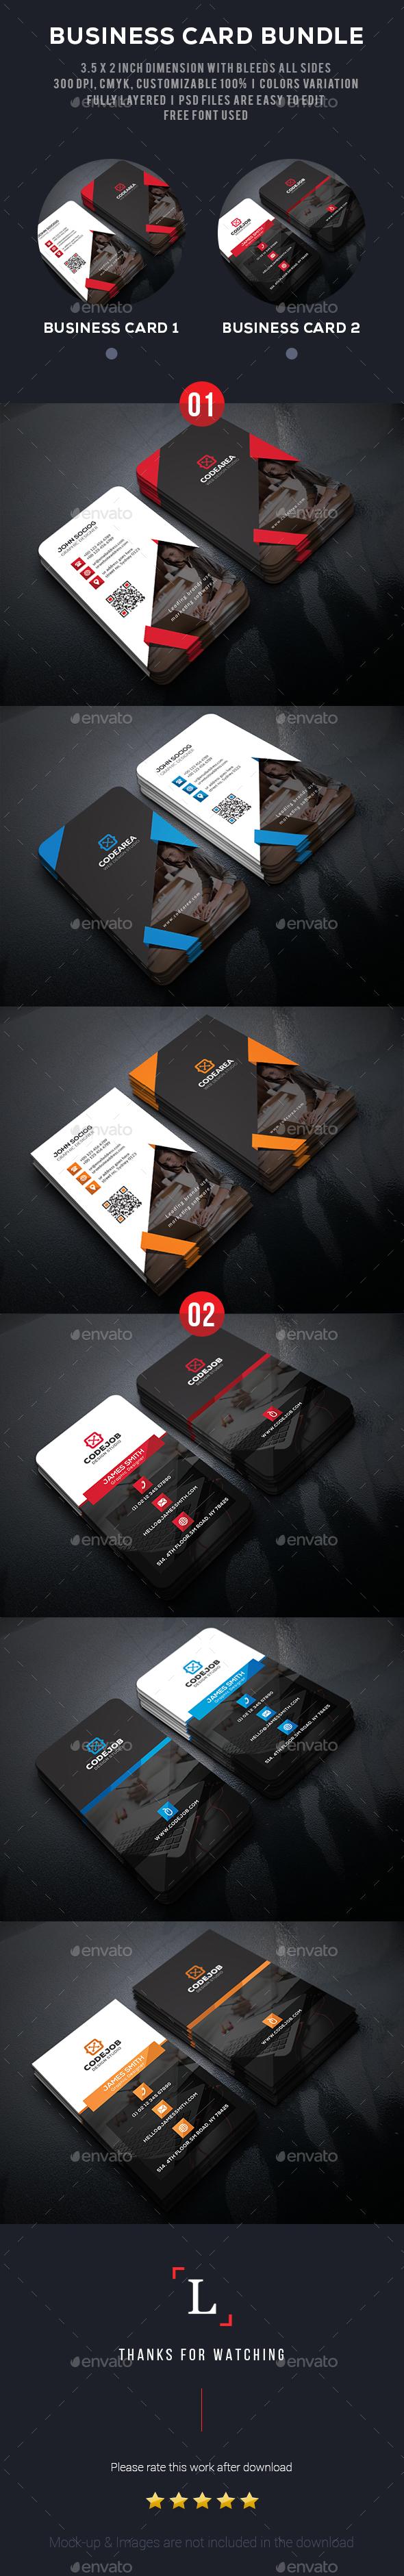 Dark Business Card Bundle - Business Cards Print Templates